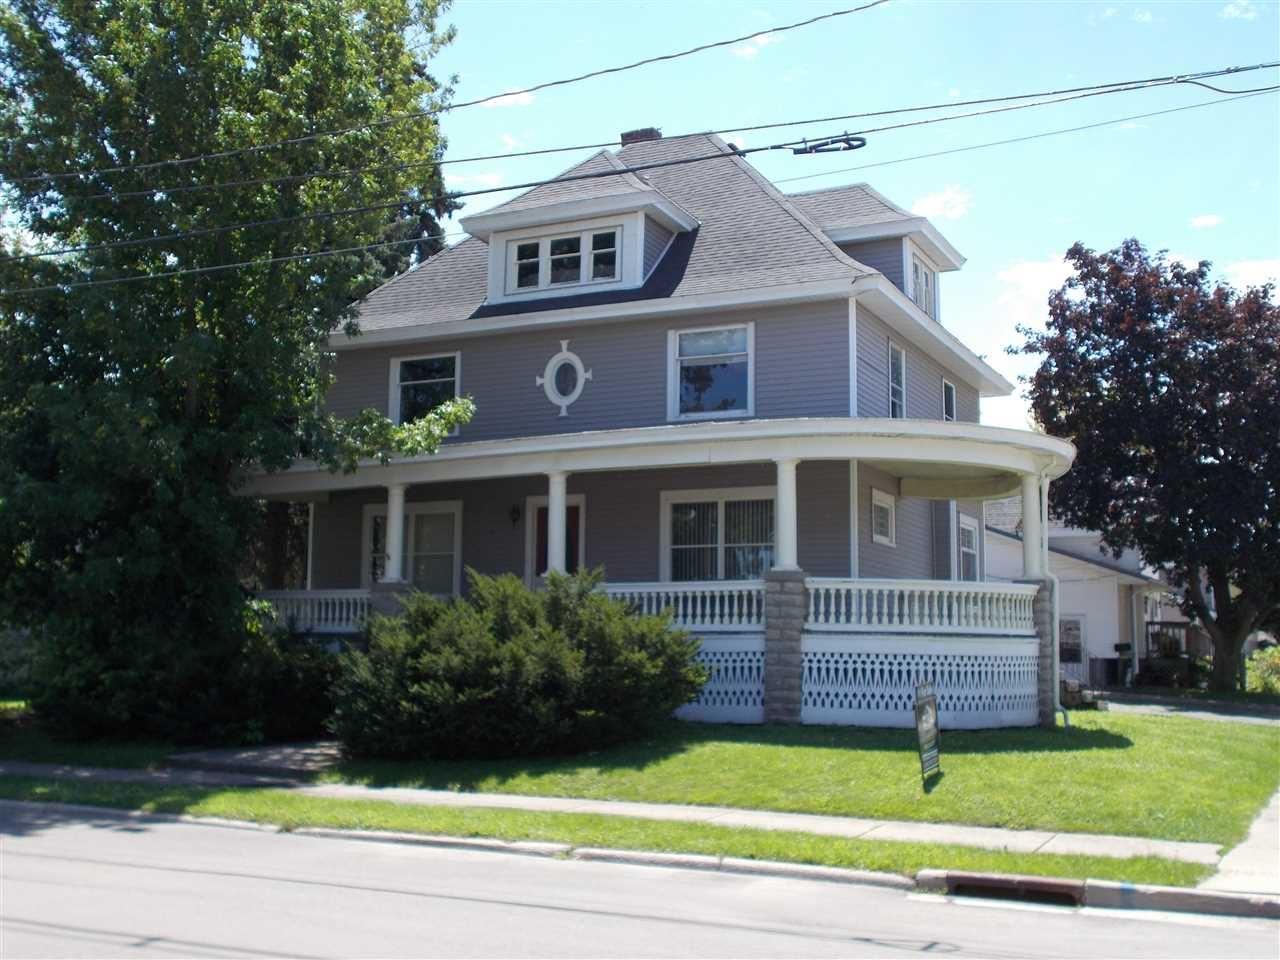 303 E Jefferson St, Waupun, WI 53963 - #: 1890768